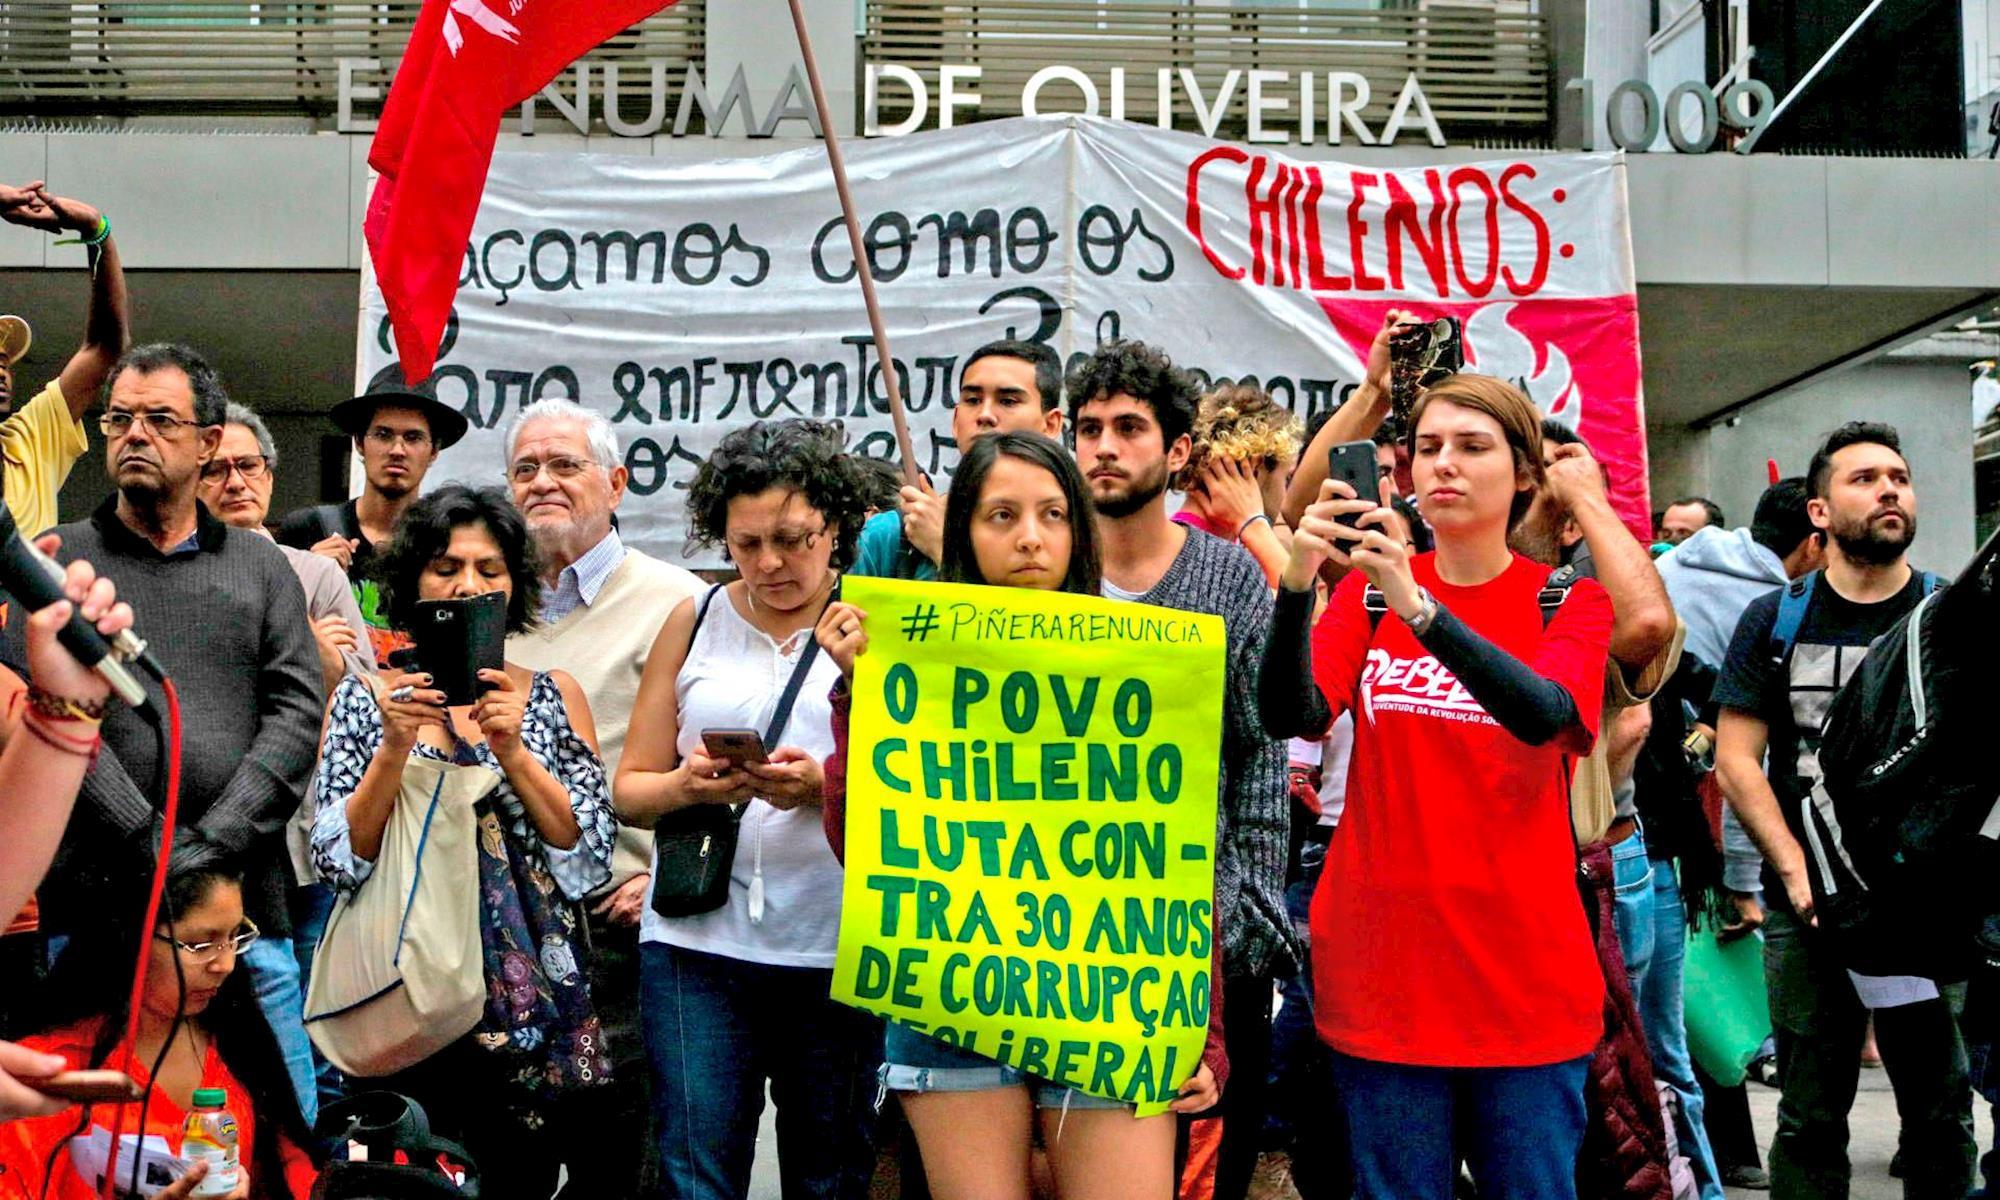 chile, protesto, são paulo, consulado, chileno, Guilherme Gandolfi